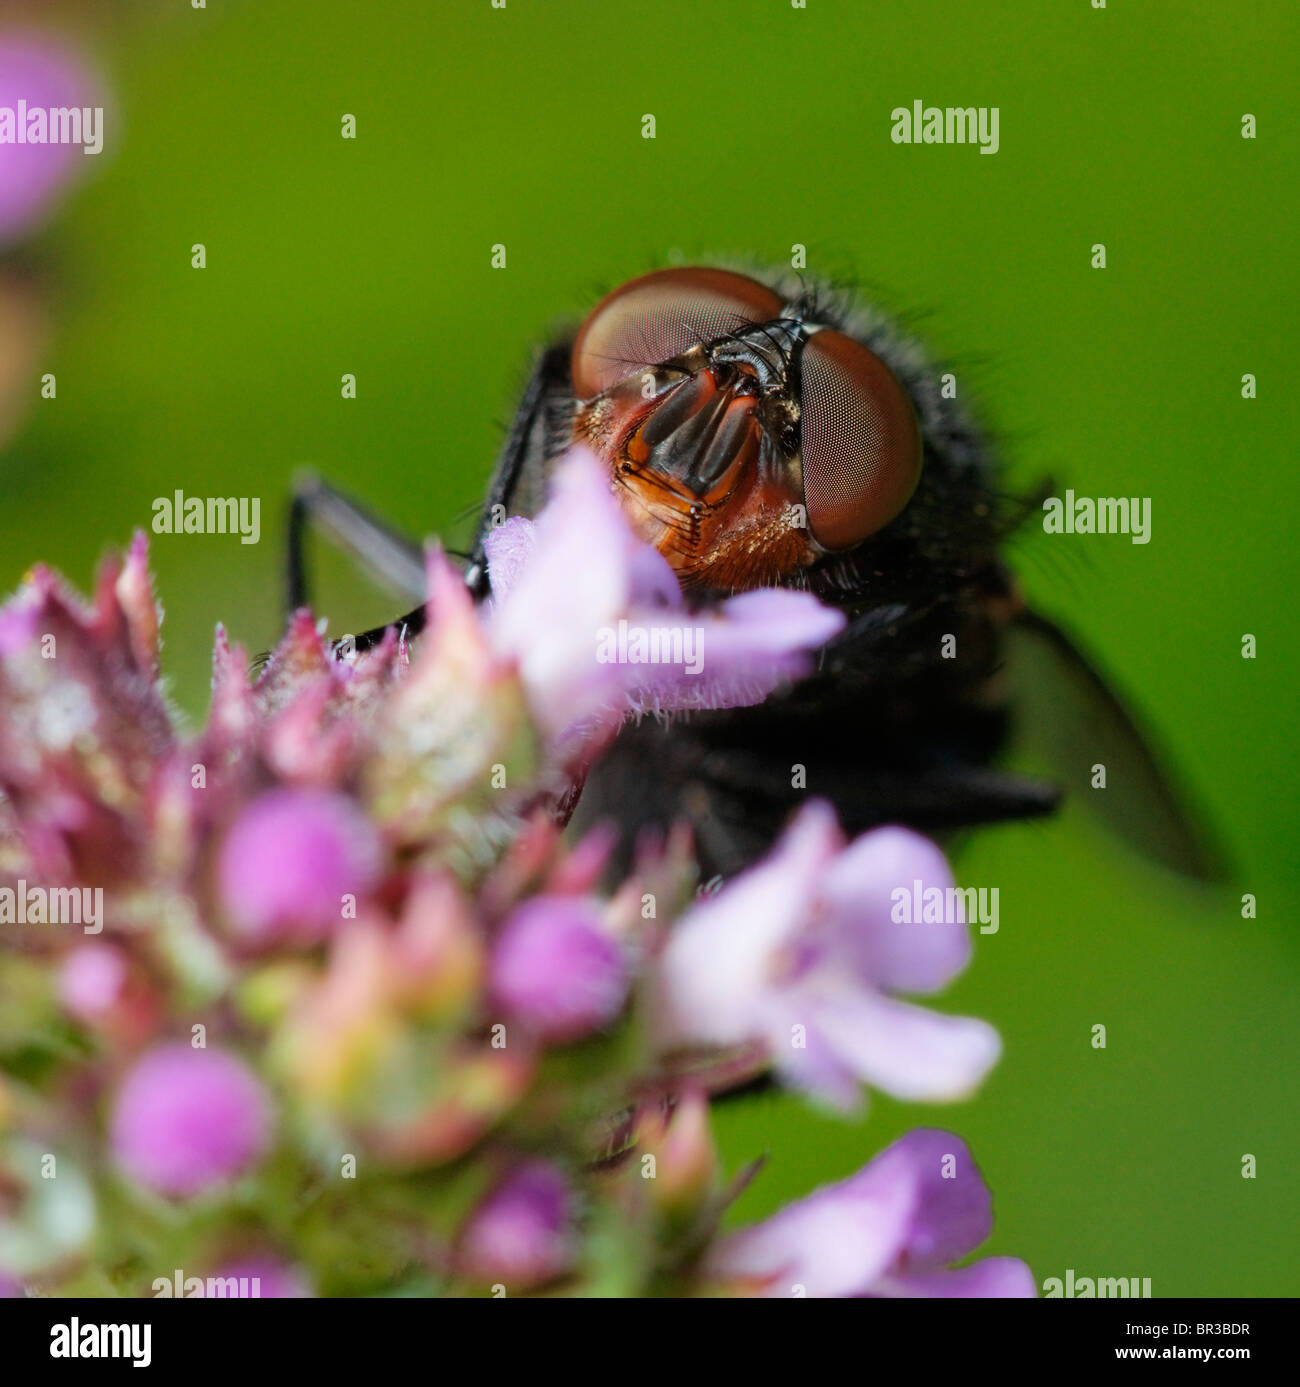 Fly feeding on a garden flower. - Stock Image